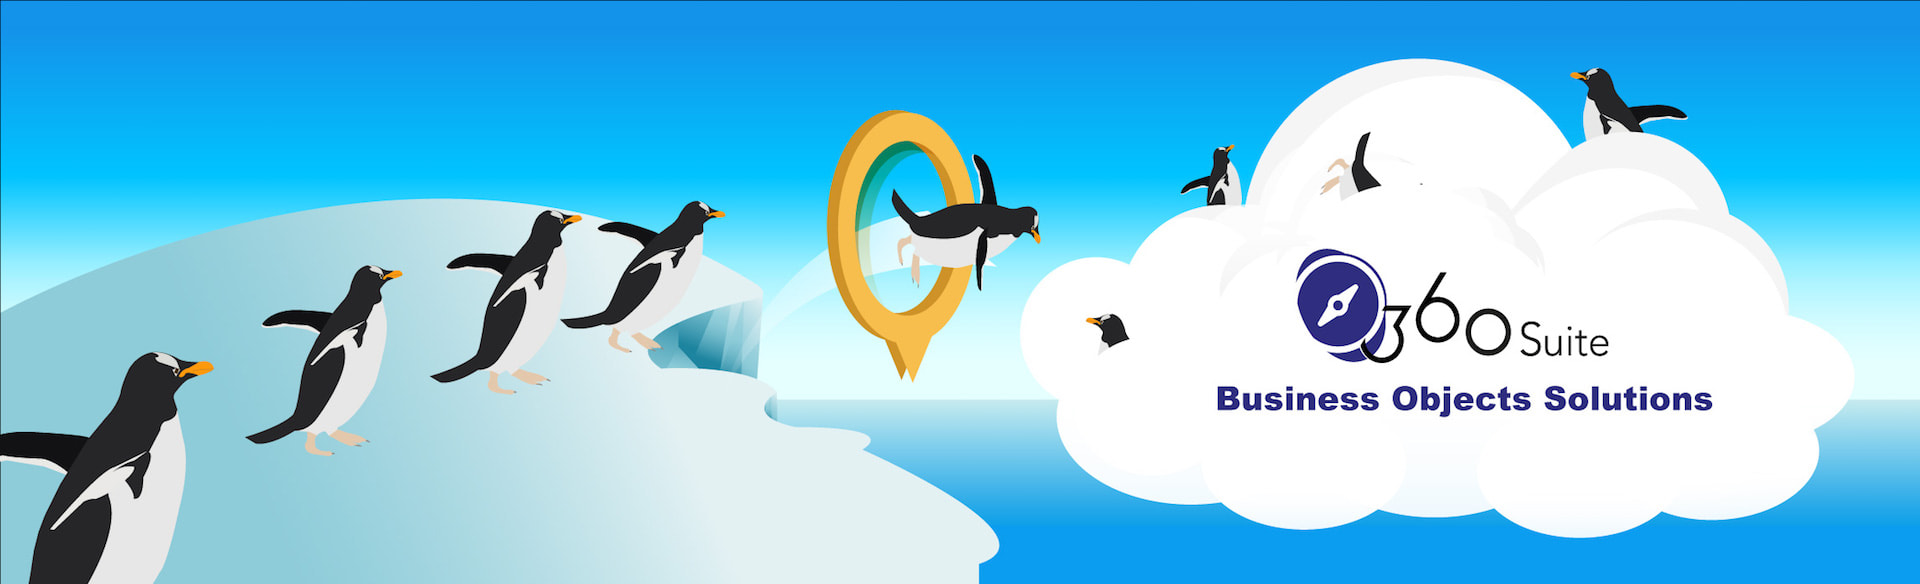 Business Objects Cloud Migration